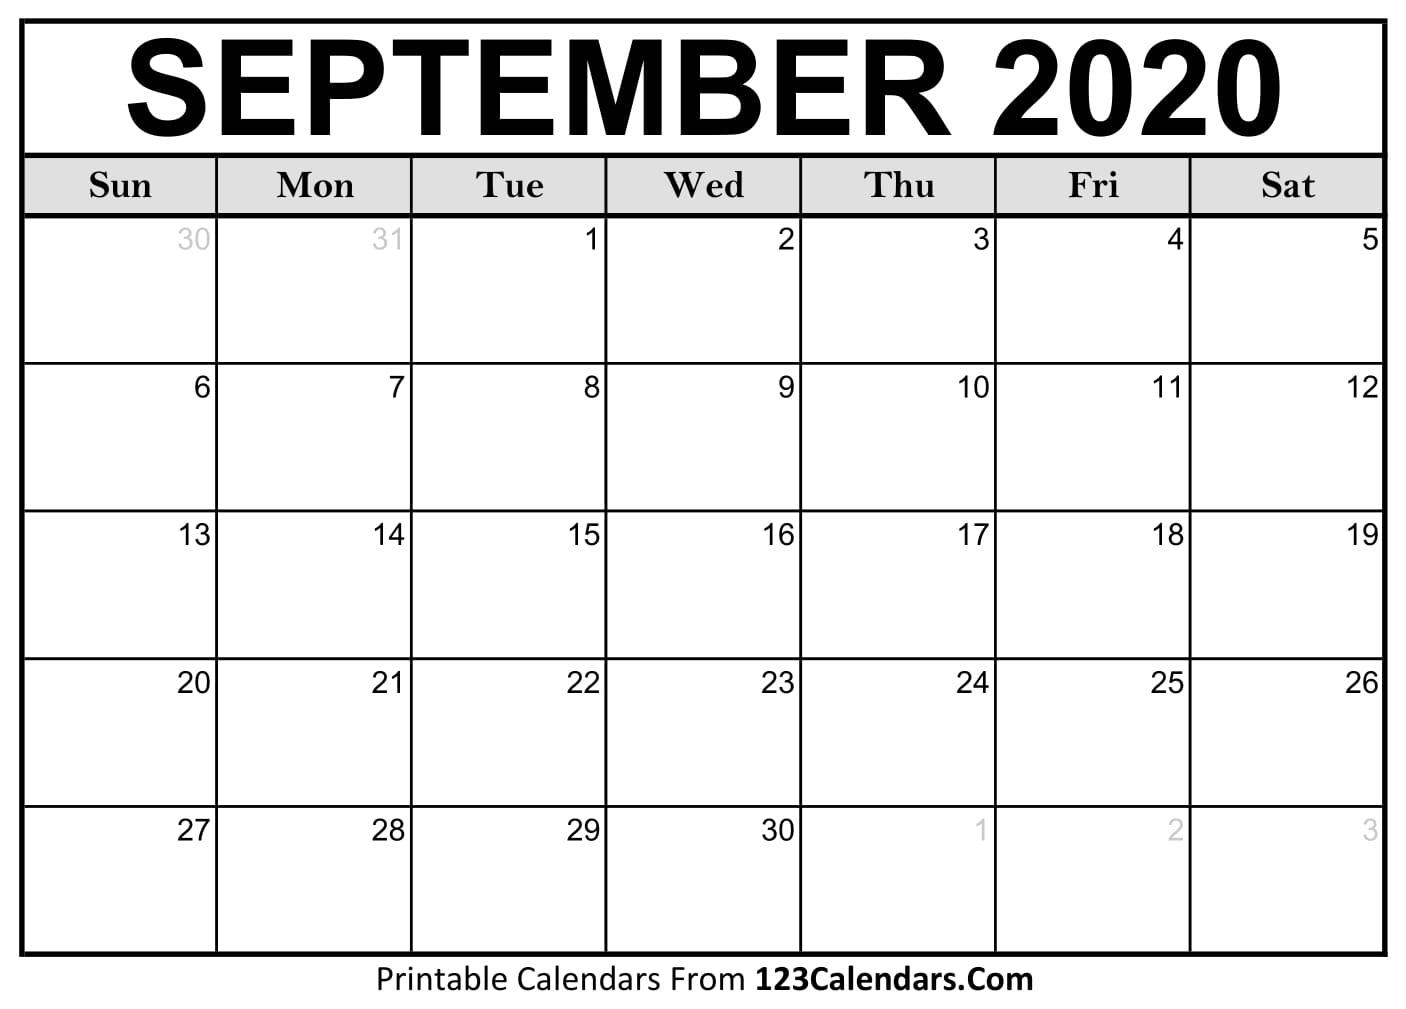 Printable September 2020 Calendar Templates | 123Calendars regarding September Blank Calendar